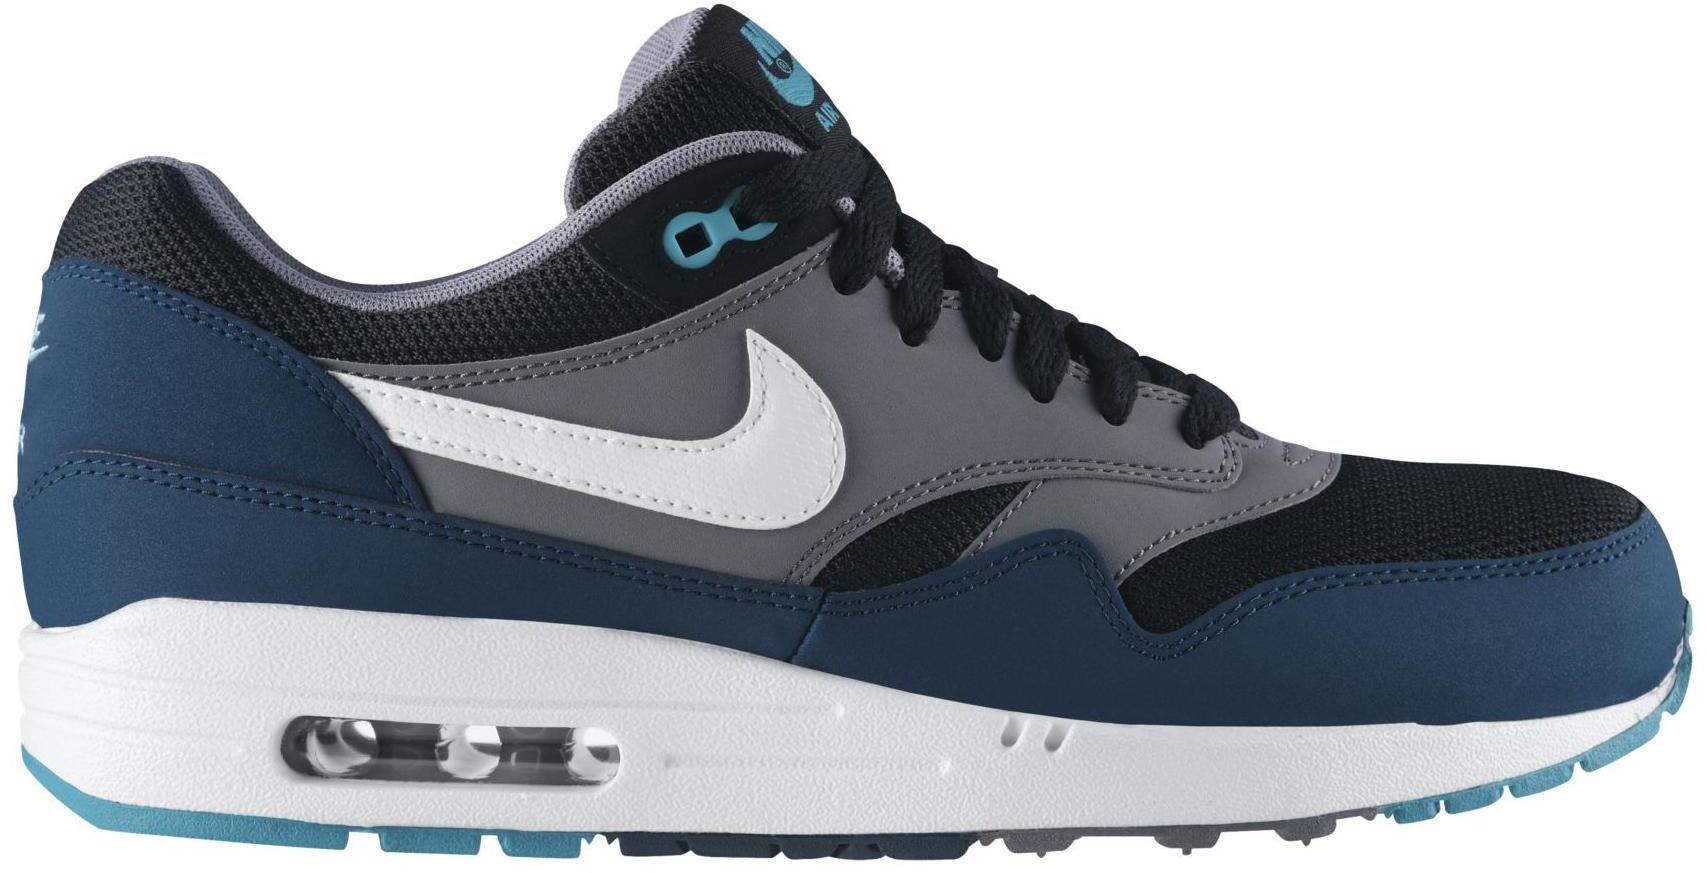 Nike Air Max 1 Black Mid Turquoise - 537383-013